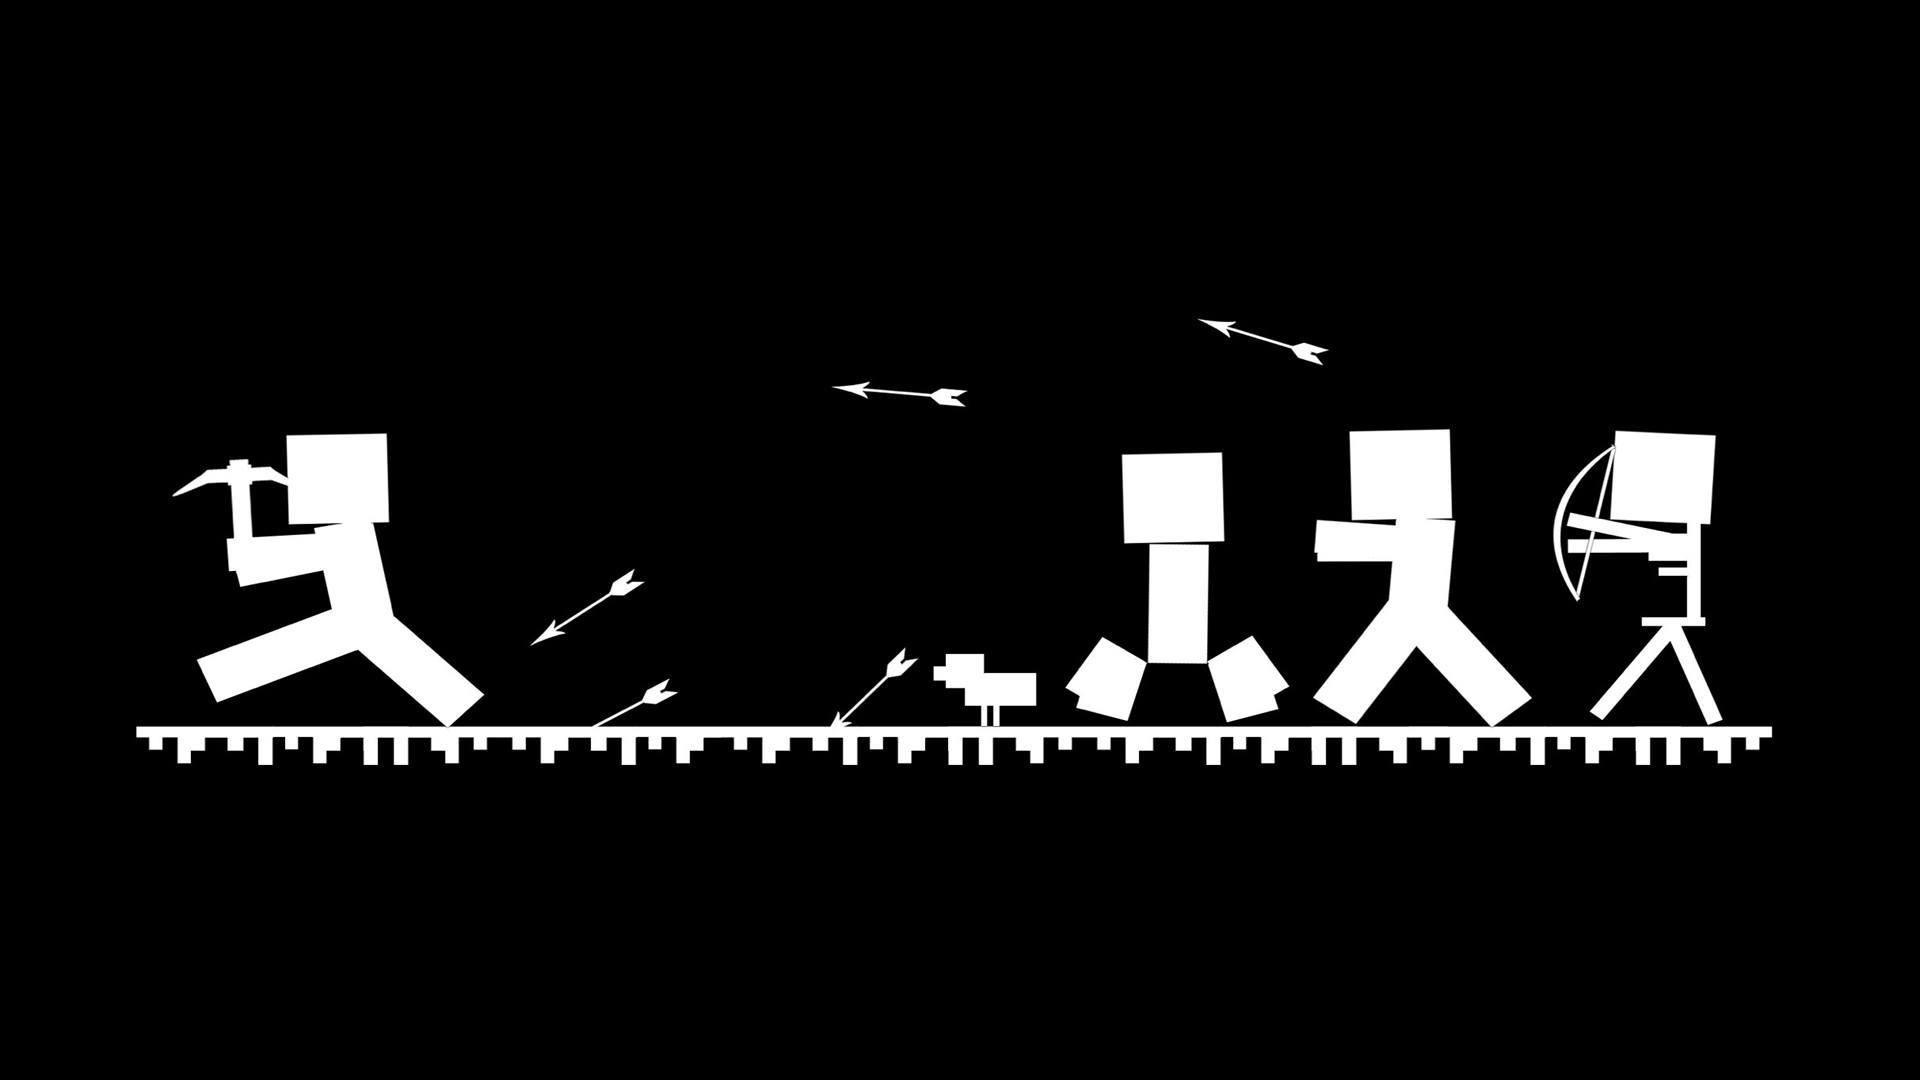 Minecraft-Wallpaper-2424x1536